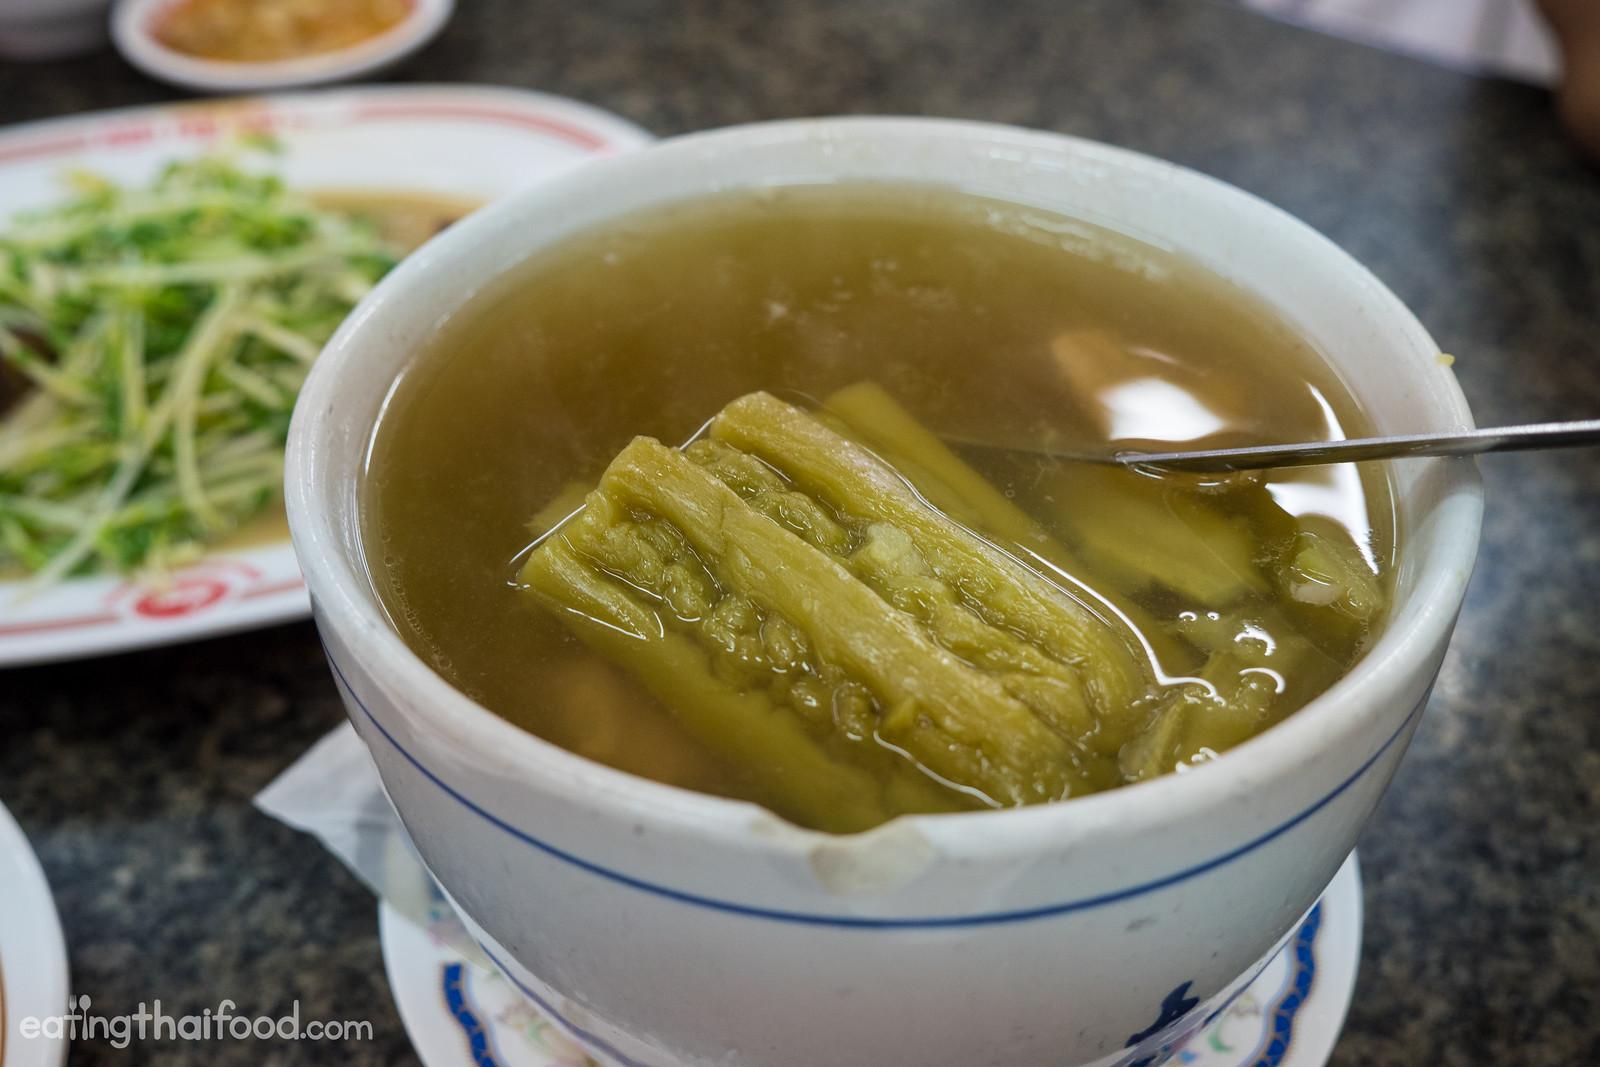 Bitter melon soup (น้ำแกงมะระตุ๋น)